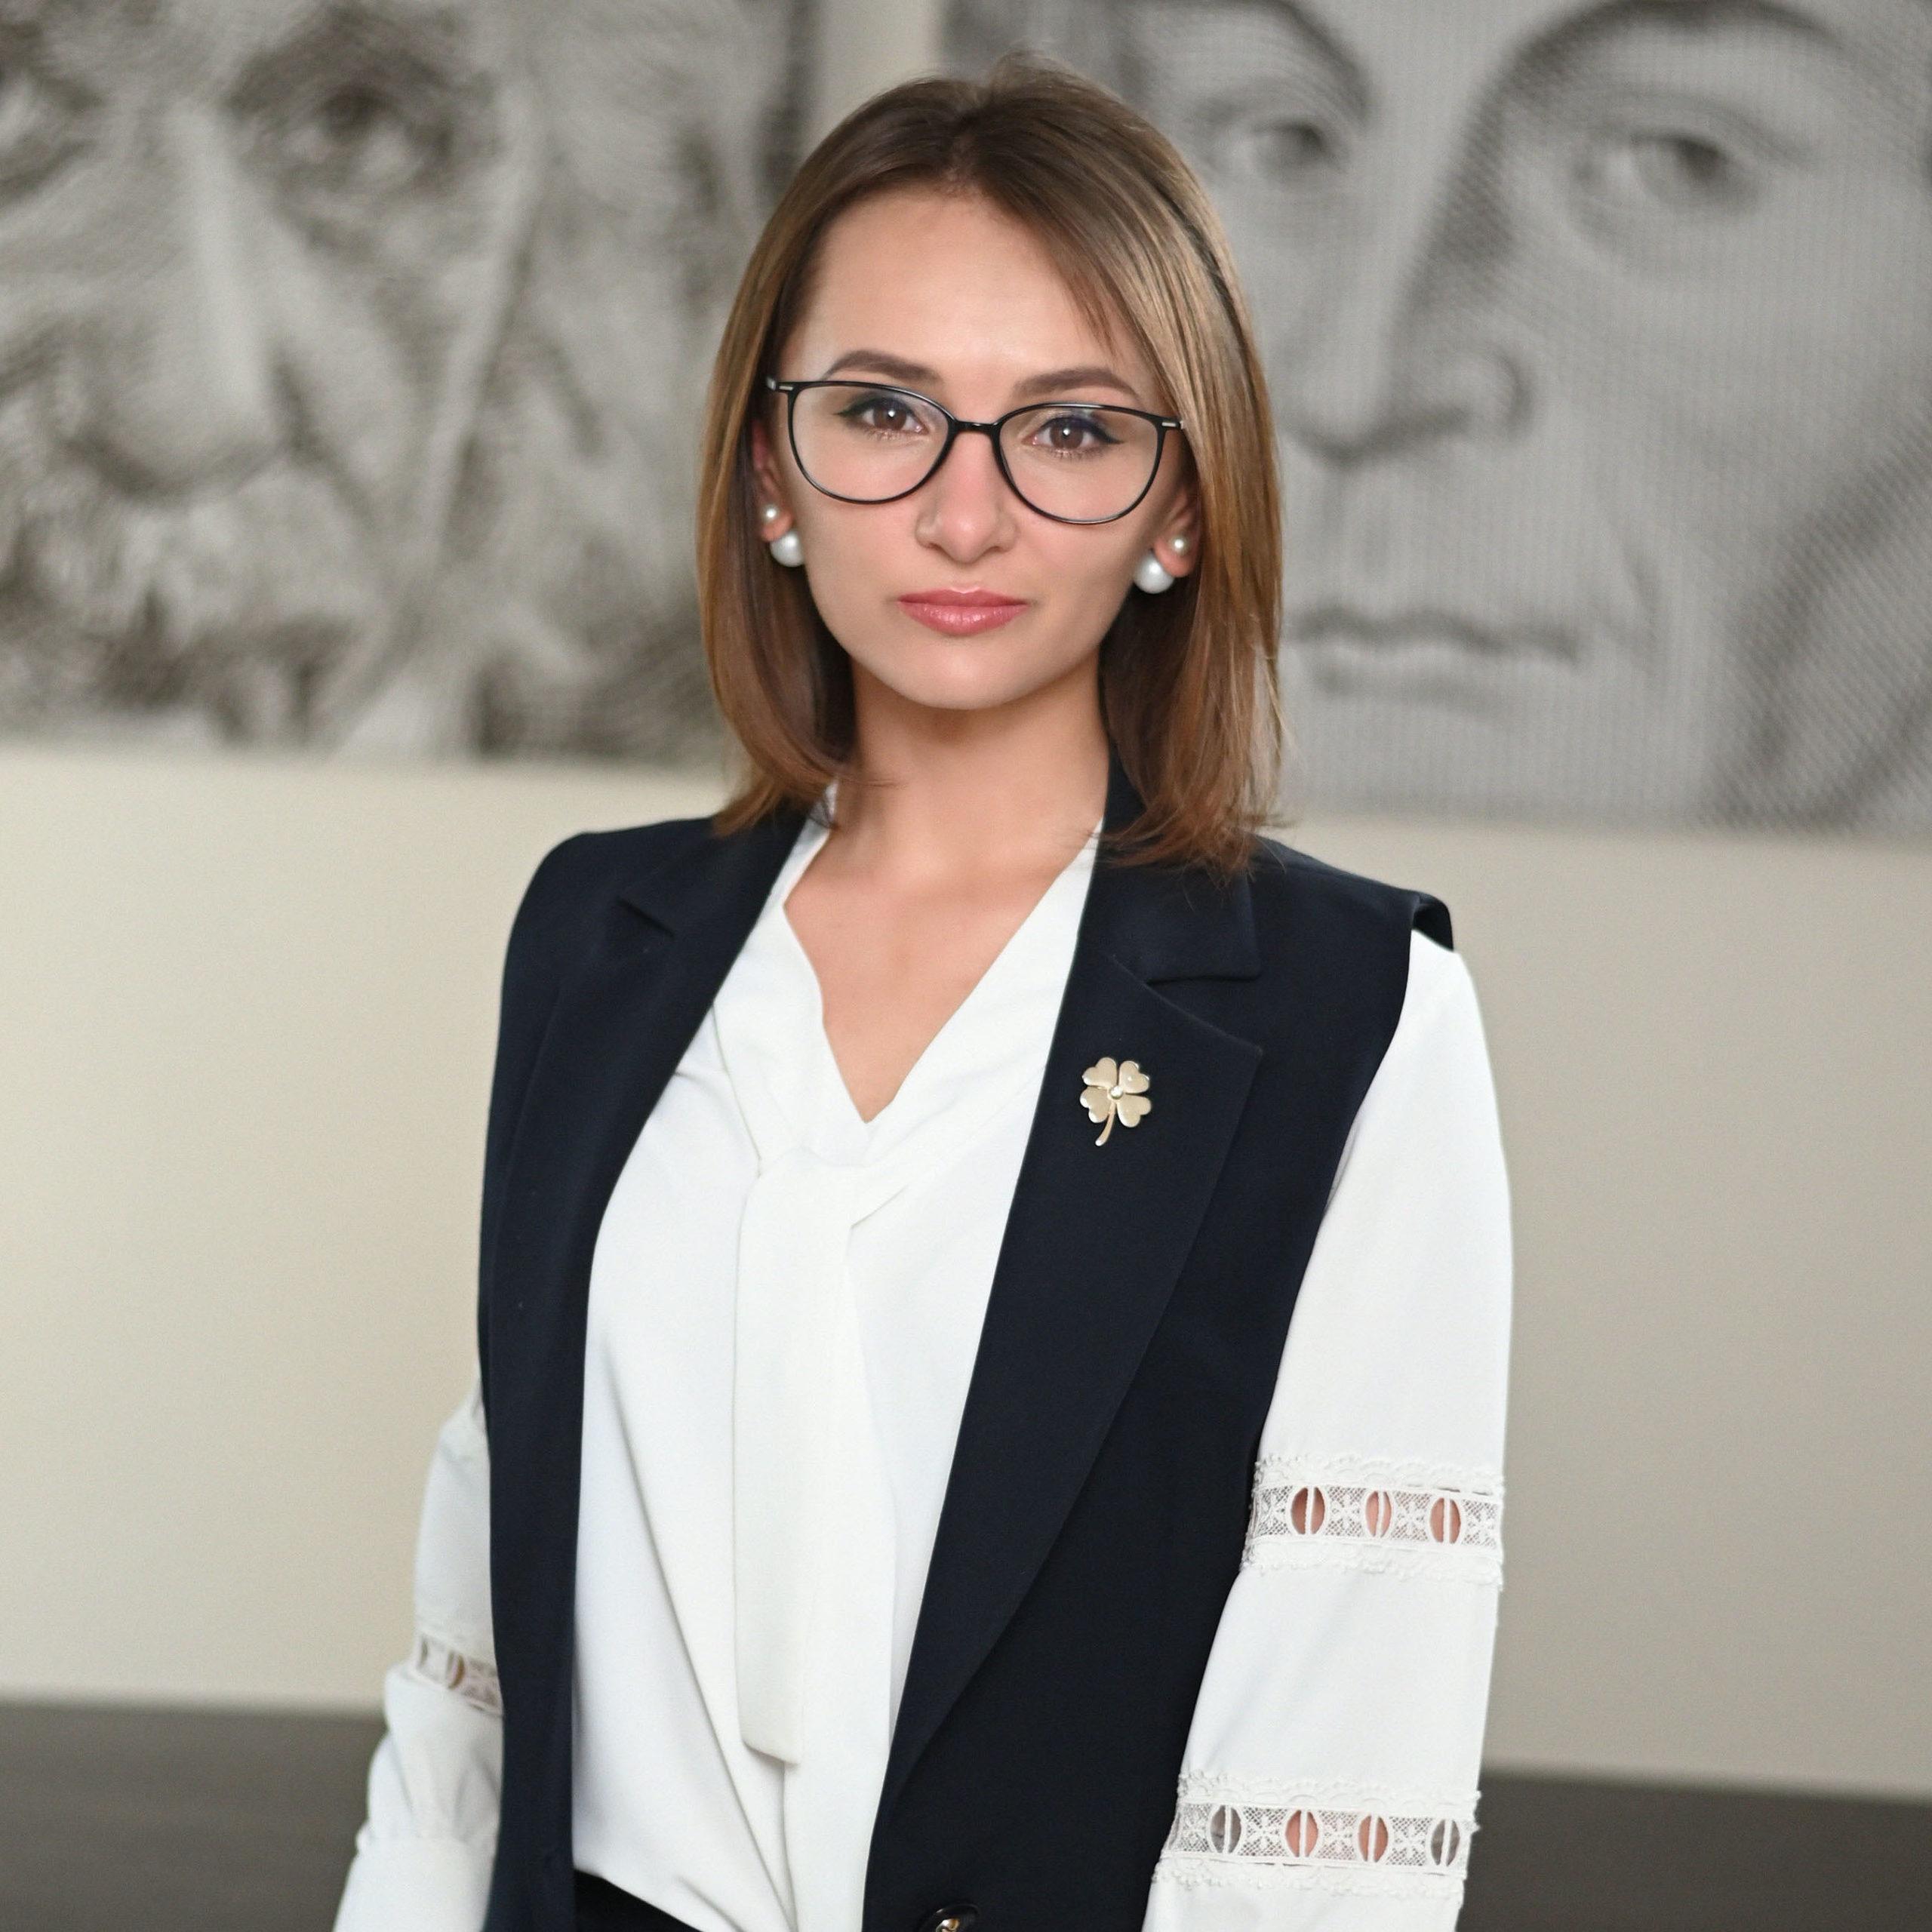 Oksana Padokh